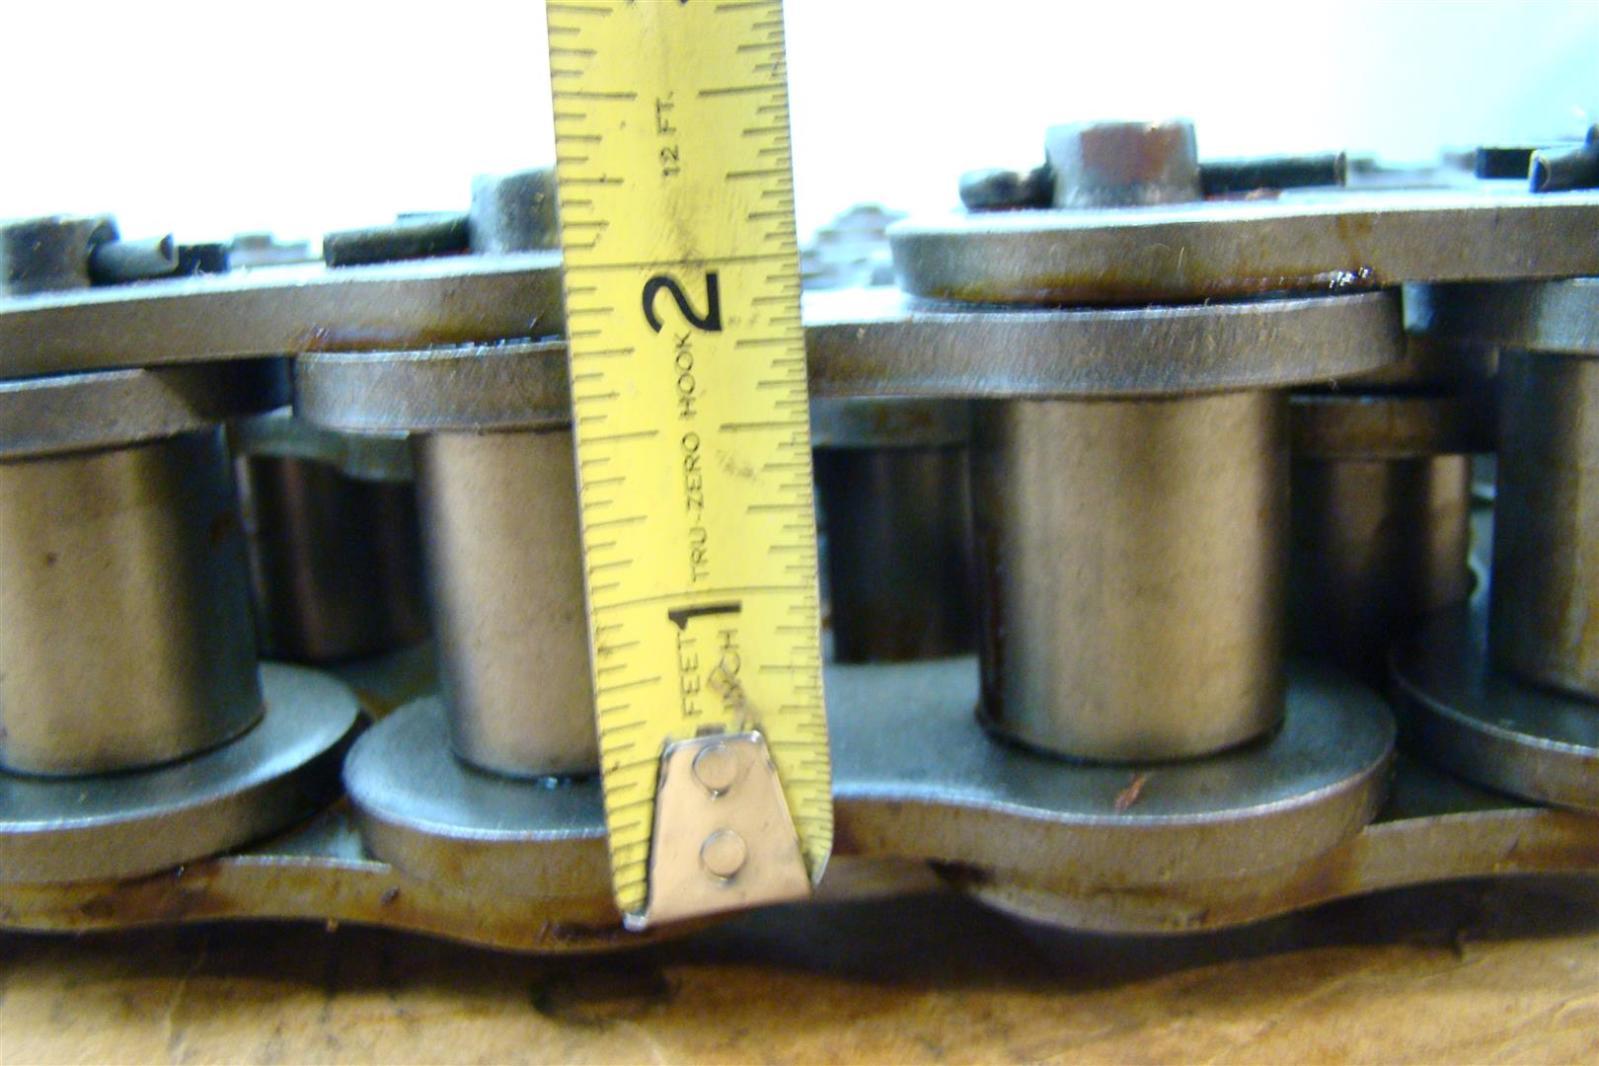 rex 160 roller chain cotter pin type 10 39 joseph fazzio incorporated. Black Bedroom Furniture Sets. Home Design Ideas